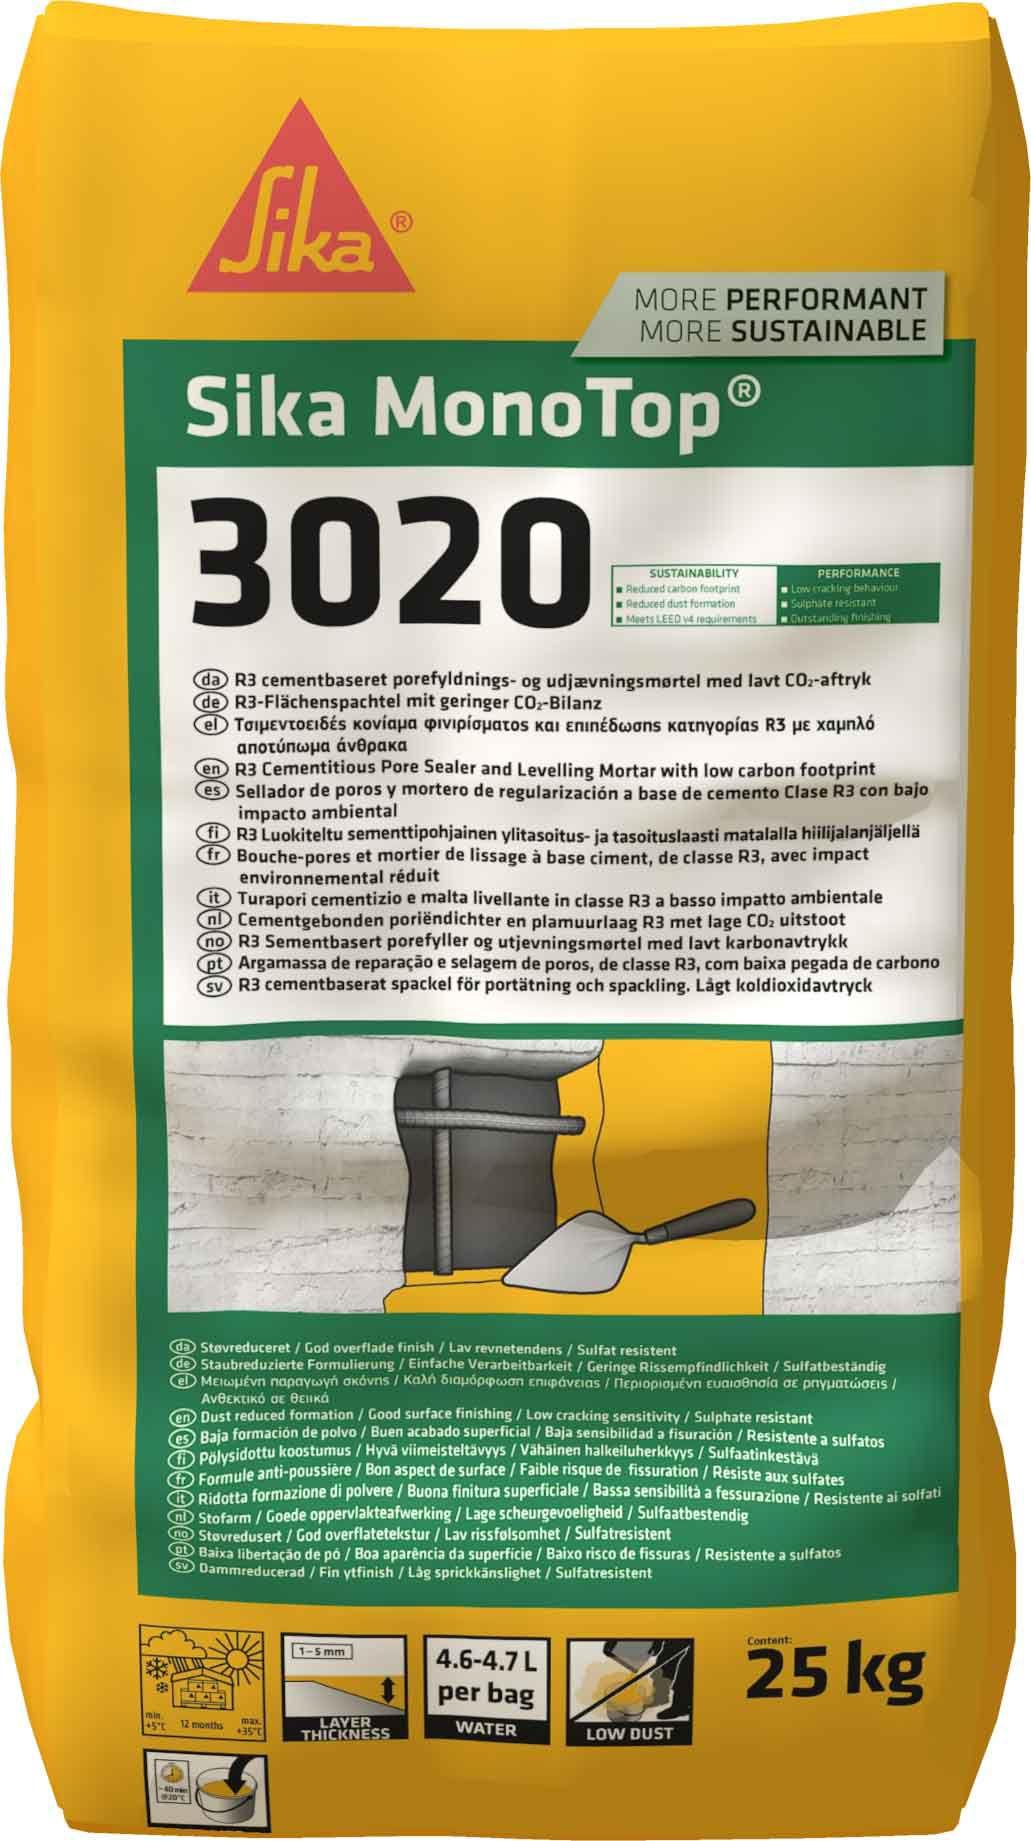 Sika Monotop 3020